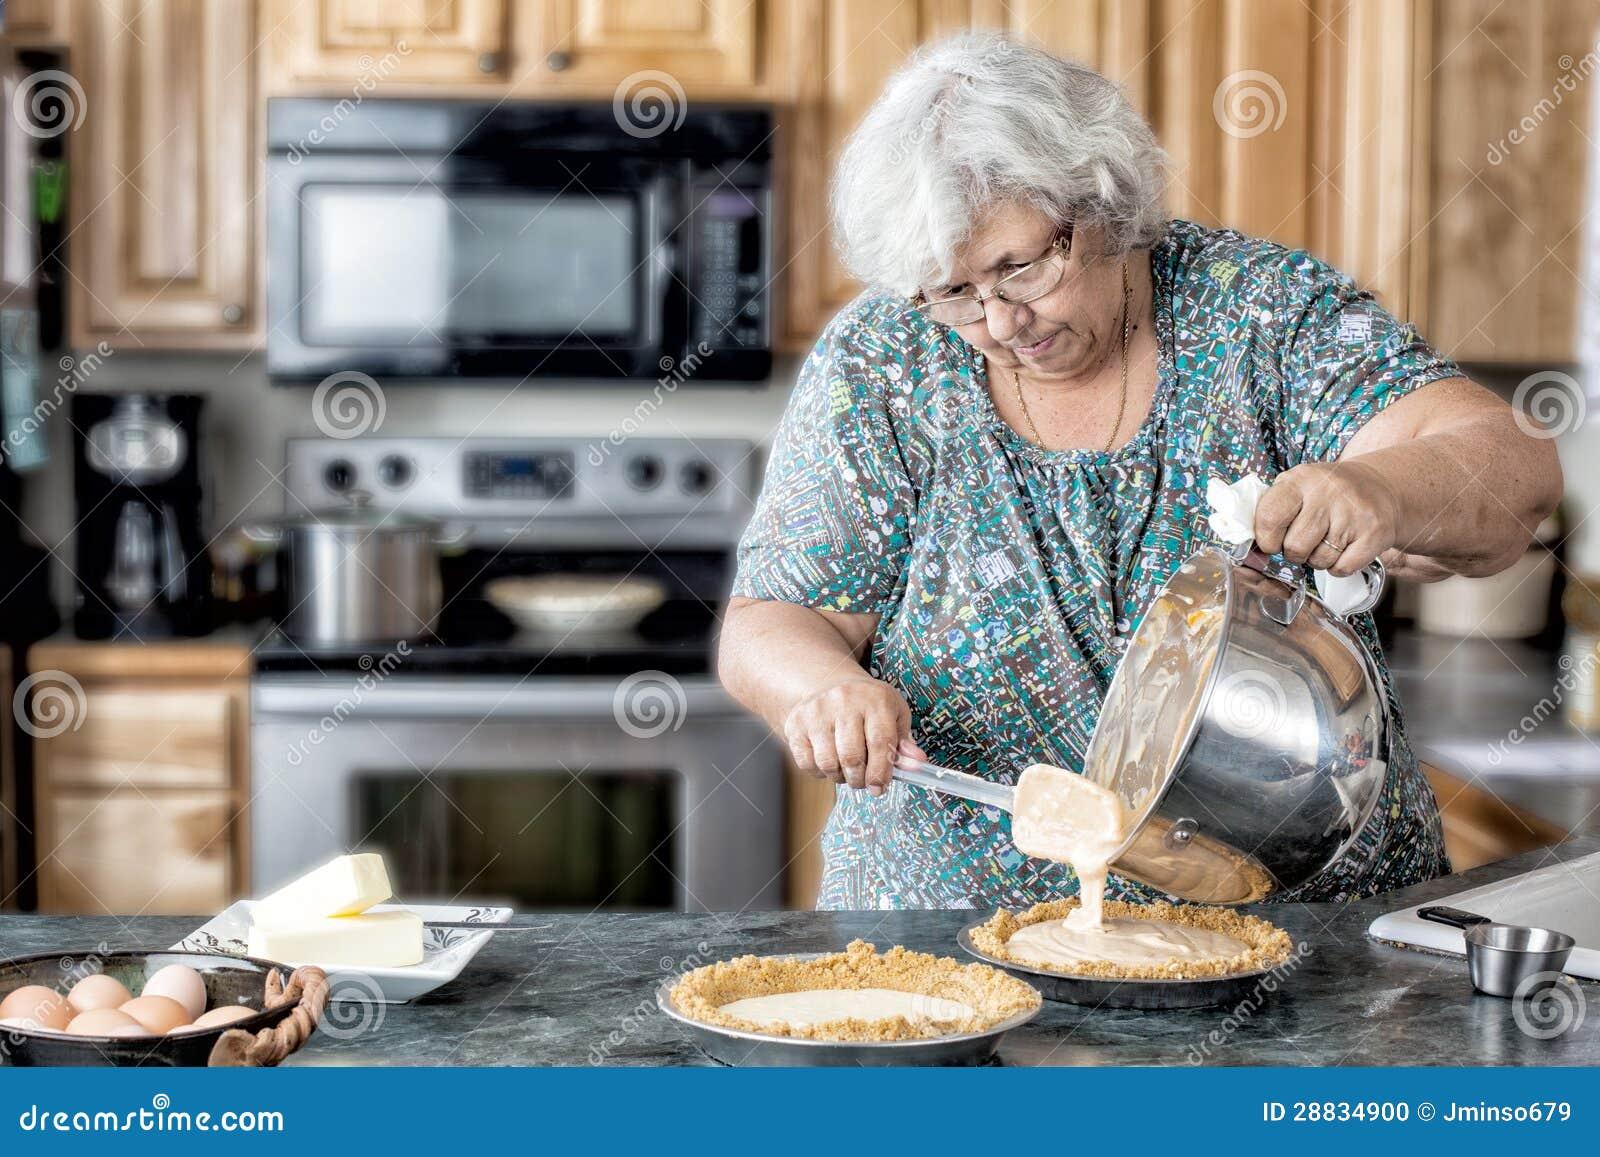 Порно мамочки дома на кухне